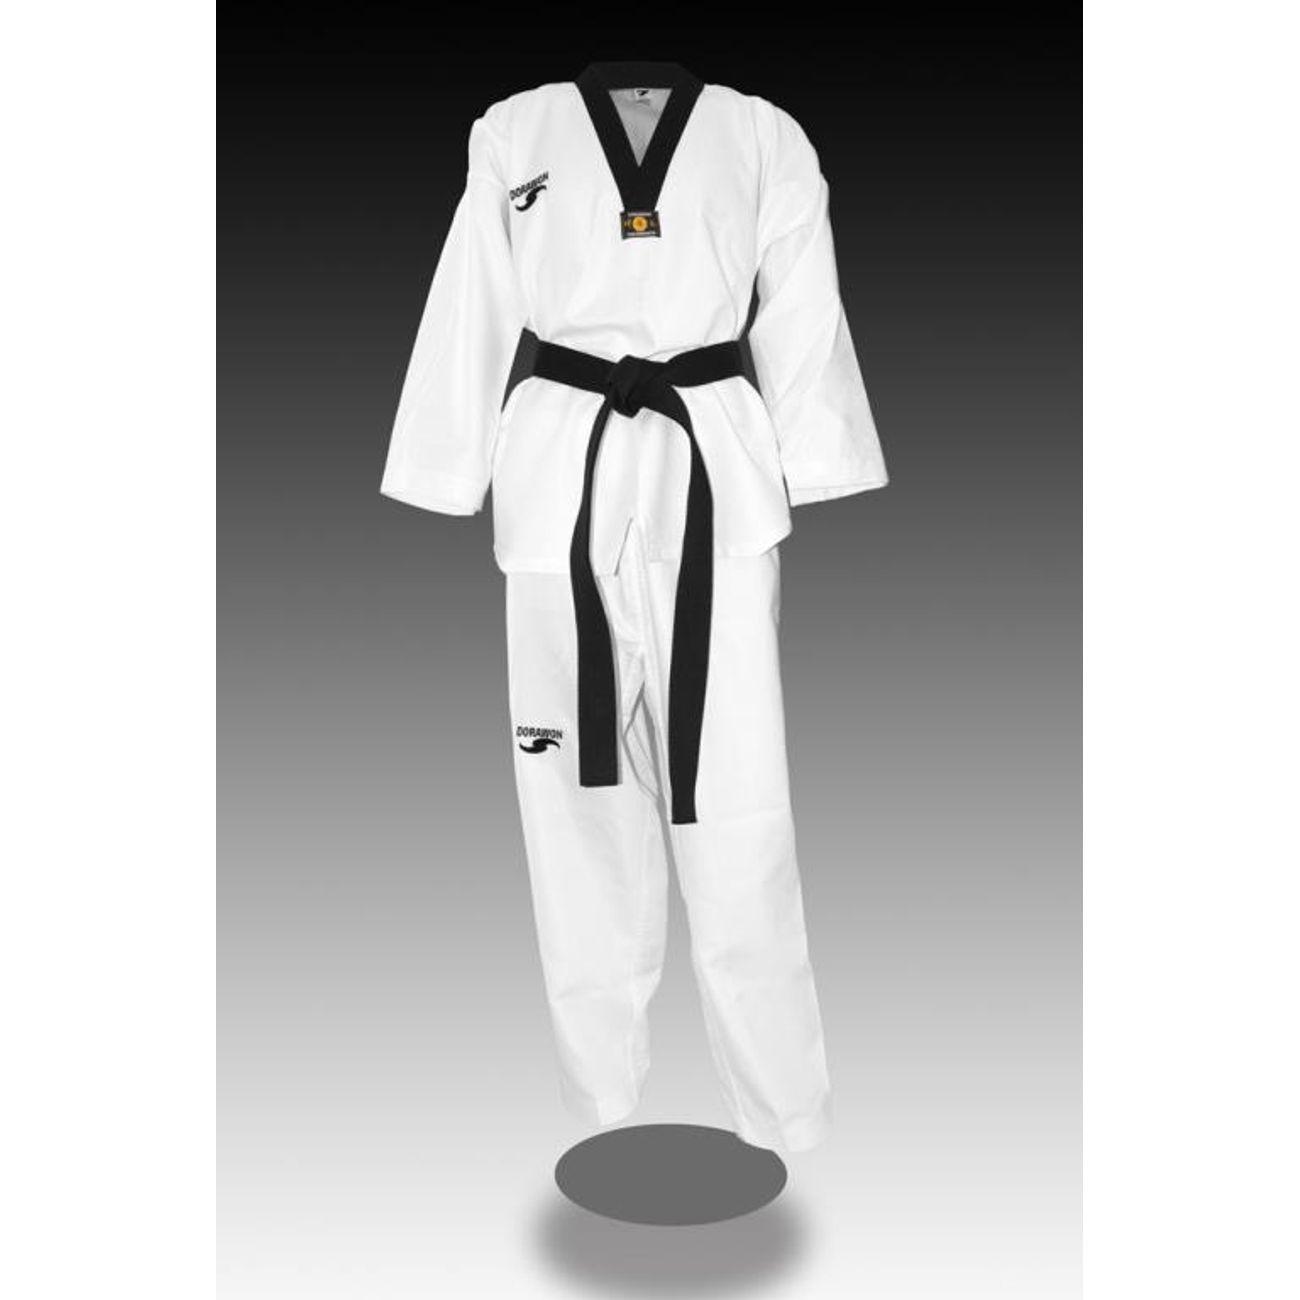 Taekwondo enfant Dorawon DORAWON, Dobok taekwondo brod? RICE, col blanc